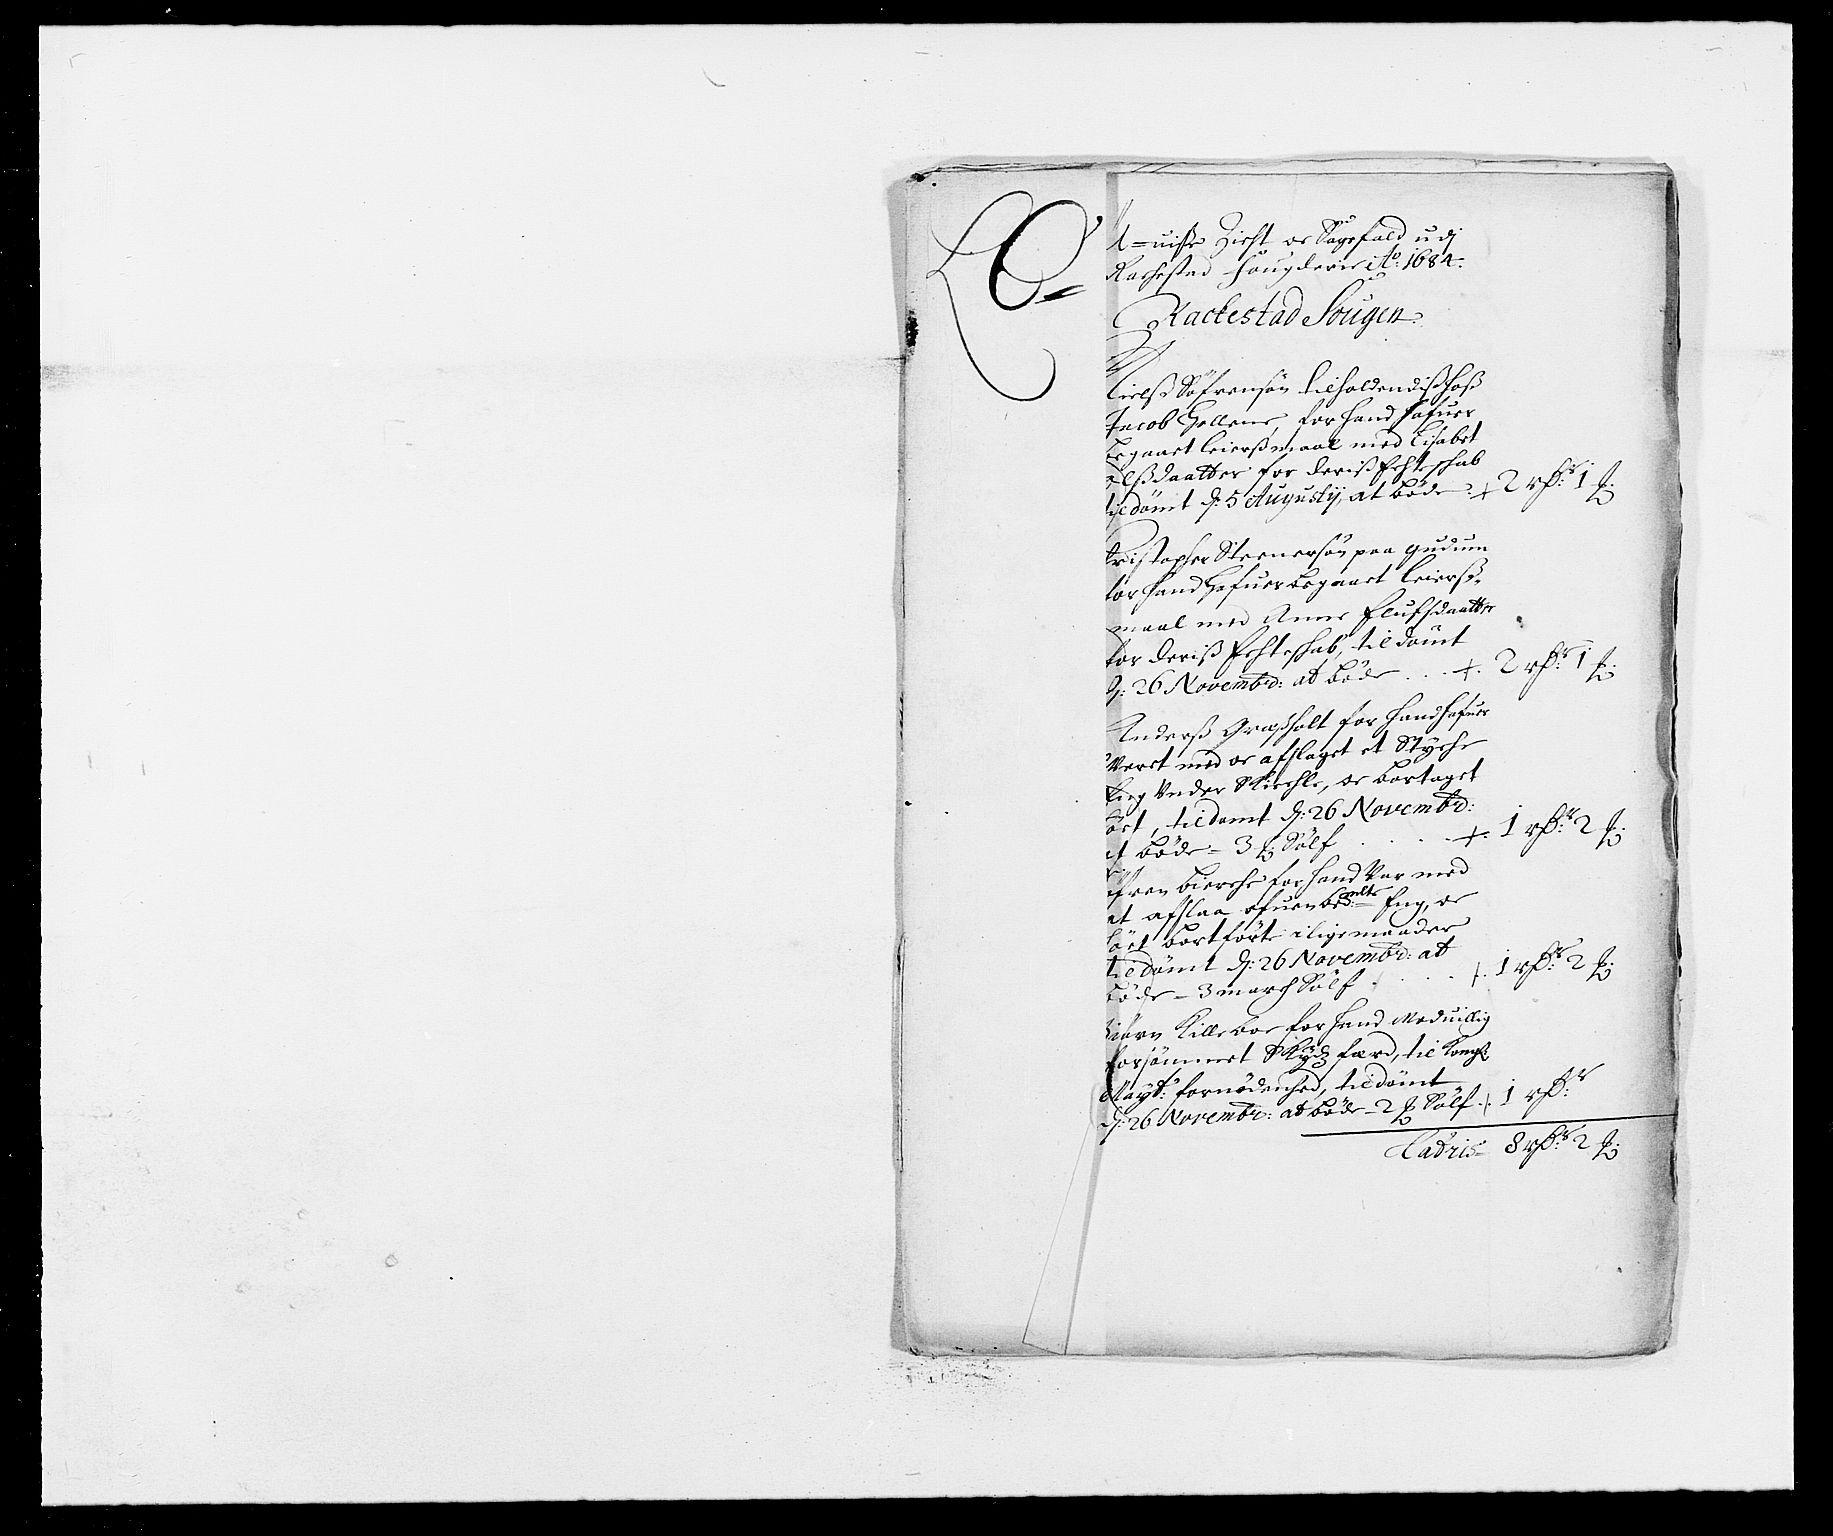 RA, Rentekammeret inntil 1814, Reviderte regnskaper, Fogderegnskap, R05/L0274: Fogderegnskap Rakkestad, 1683-1684, s. 330